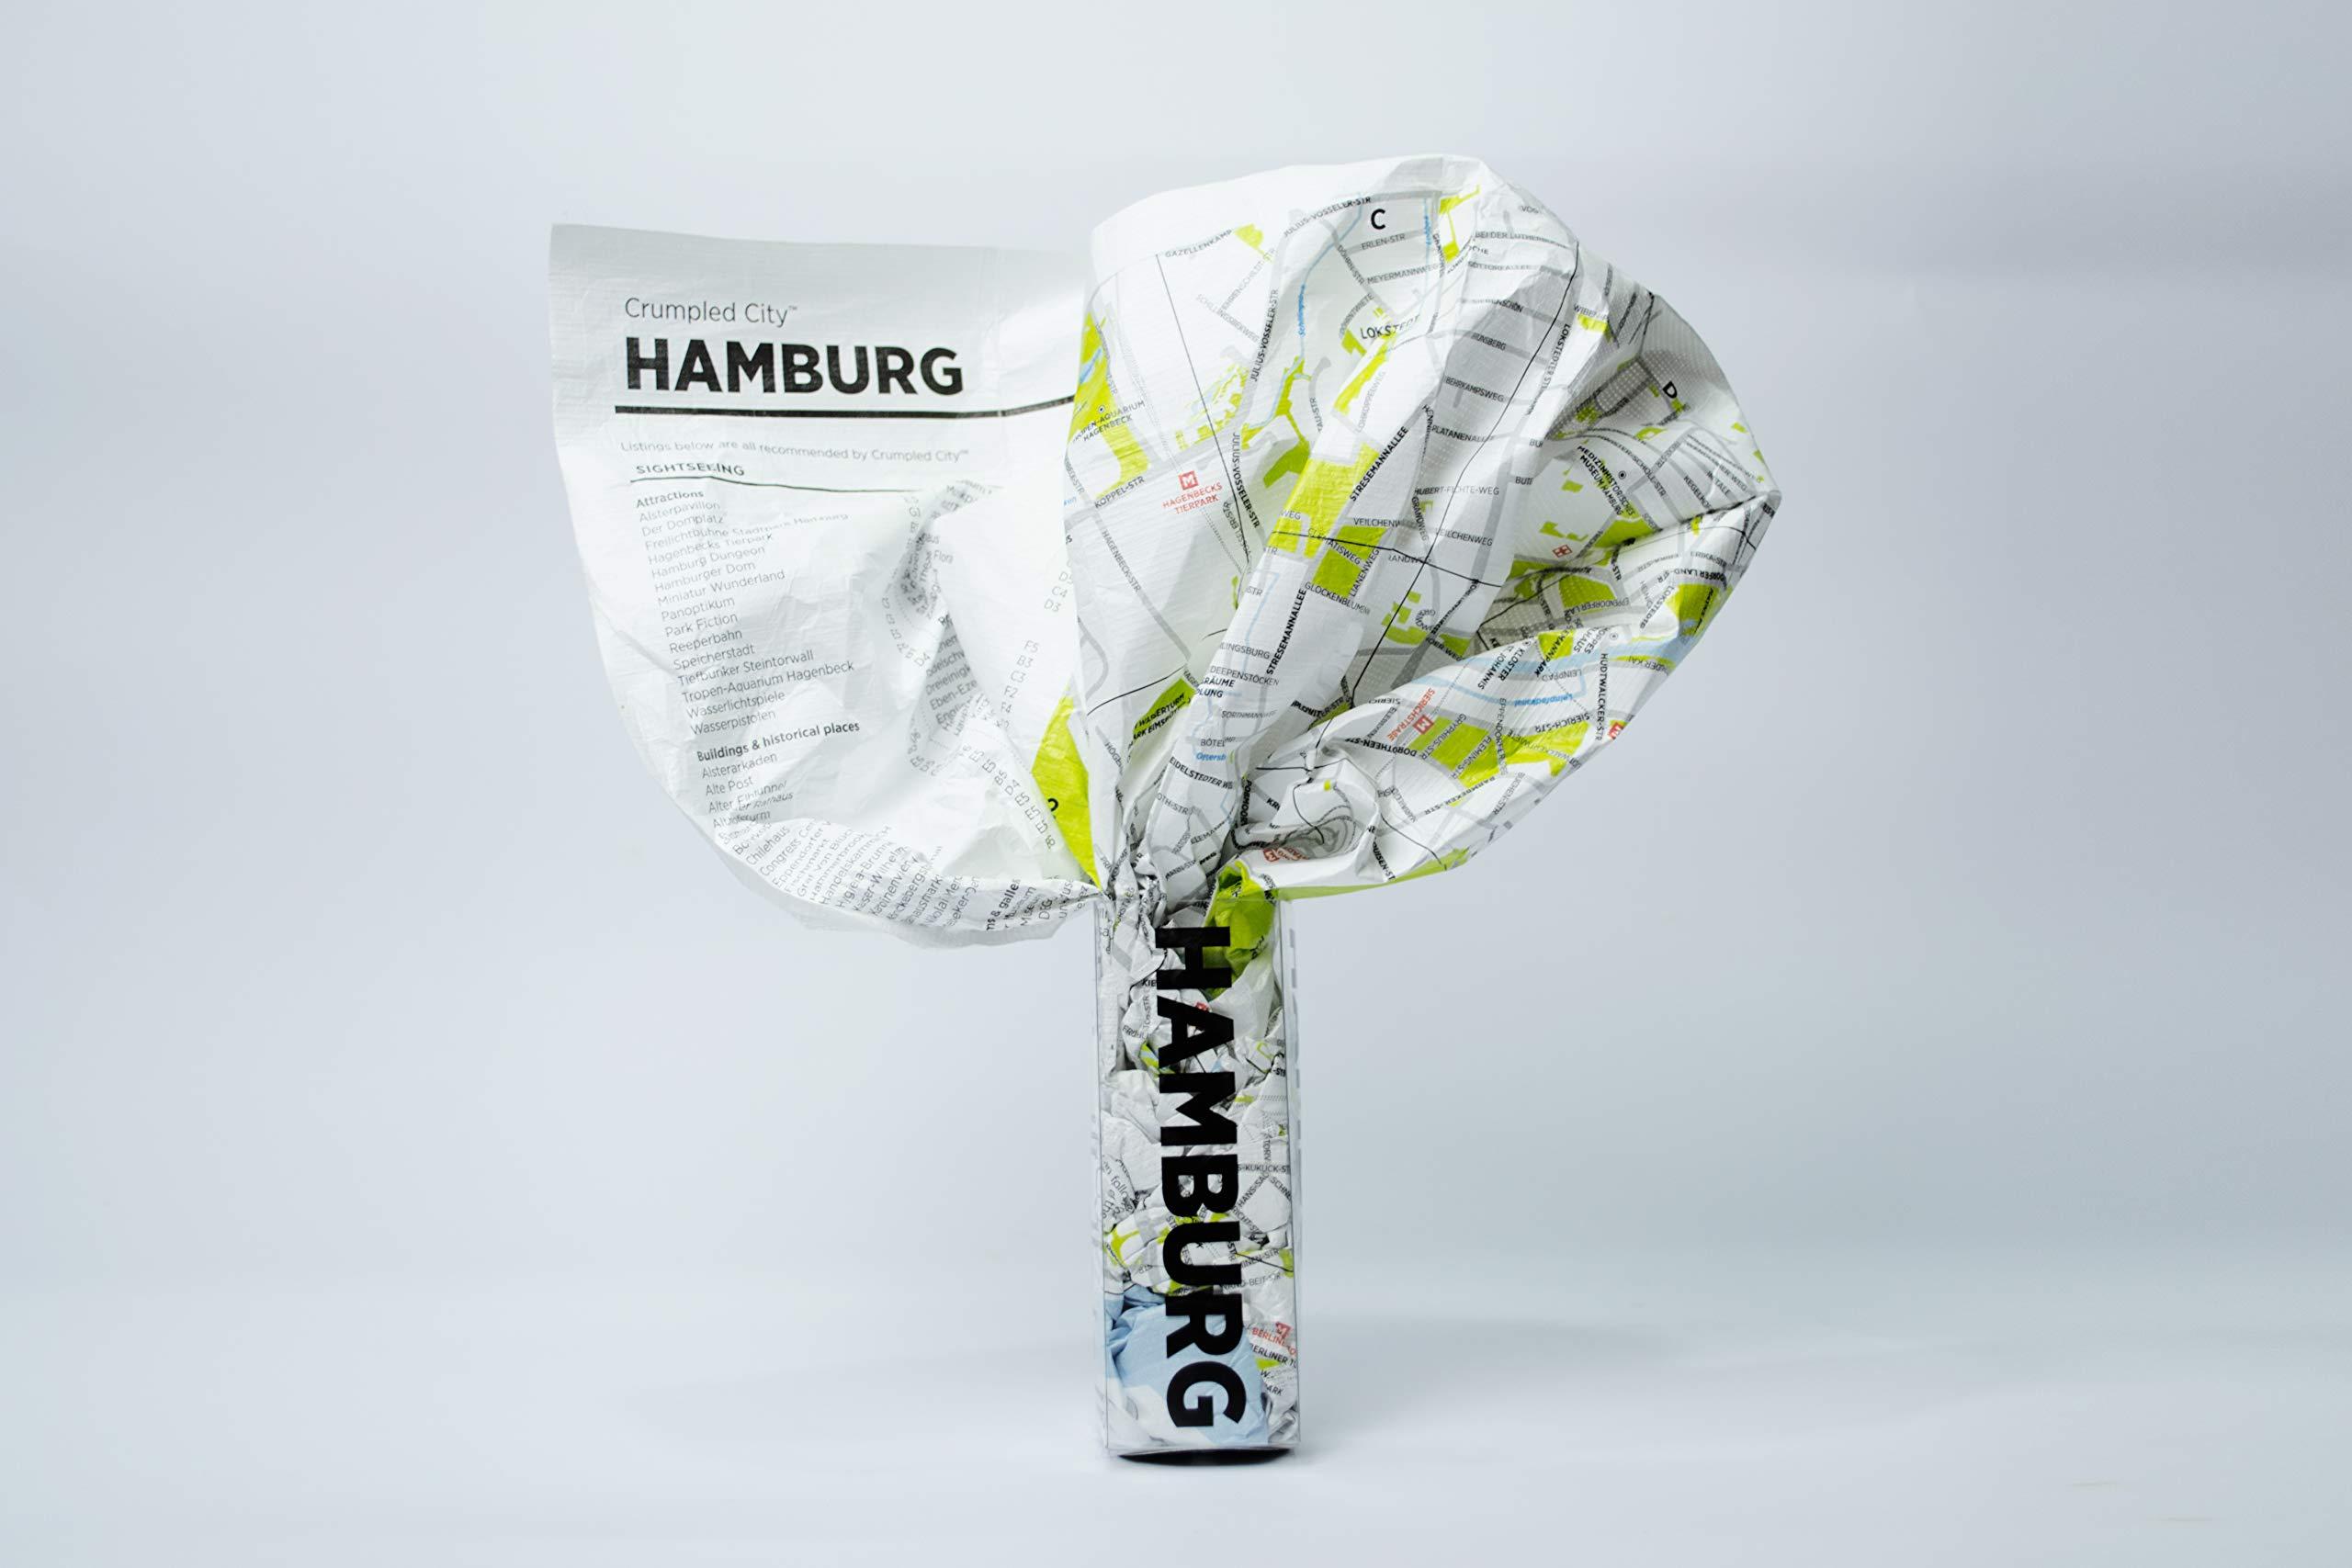 Crumpled City  Hamburg. Soft City Maps For Urban Jungles  Crumpled City Maps